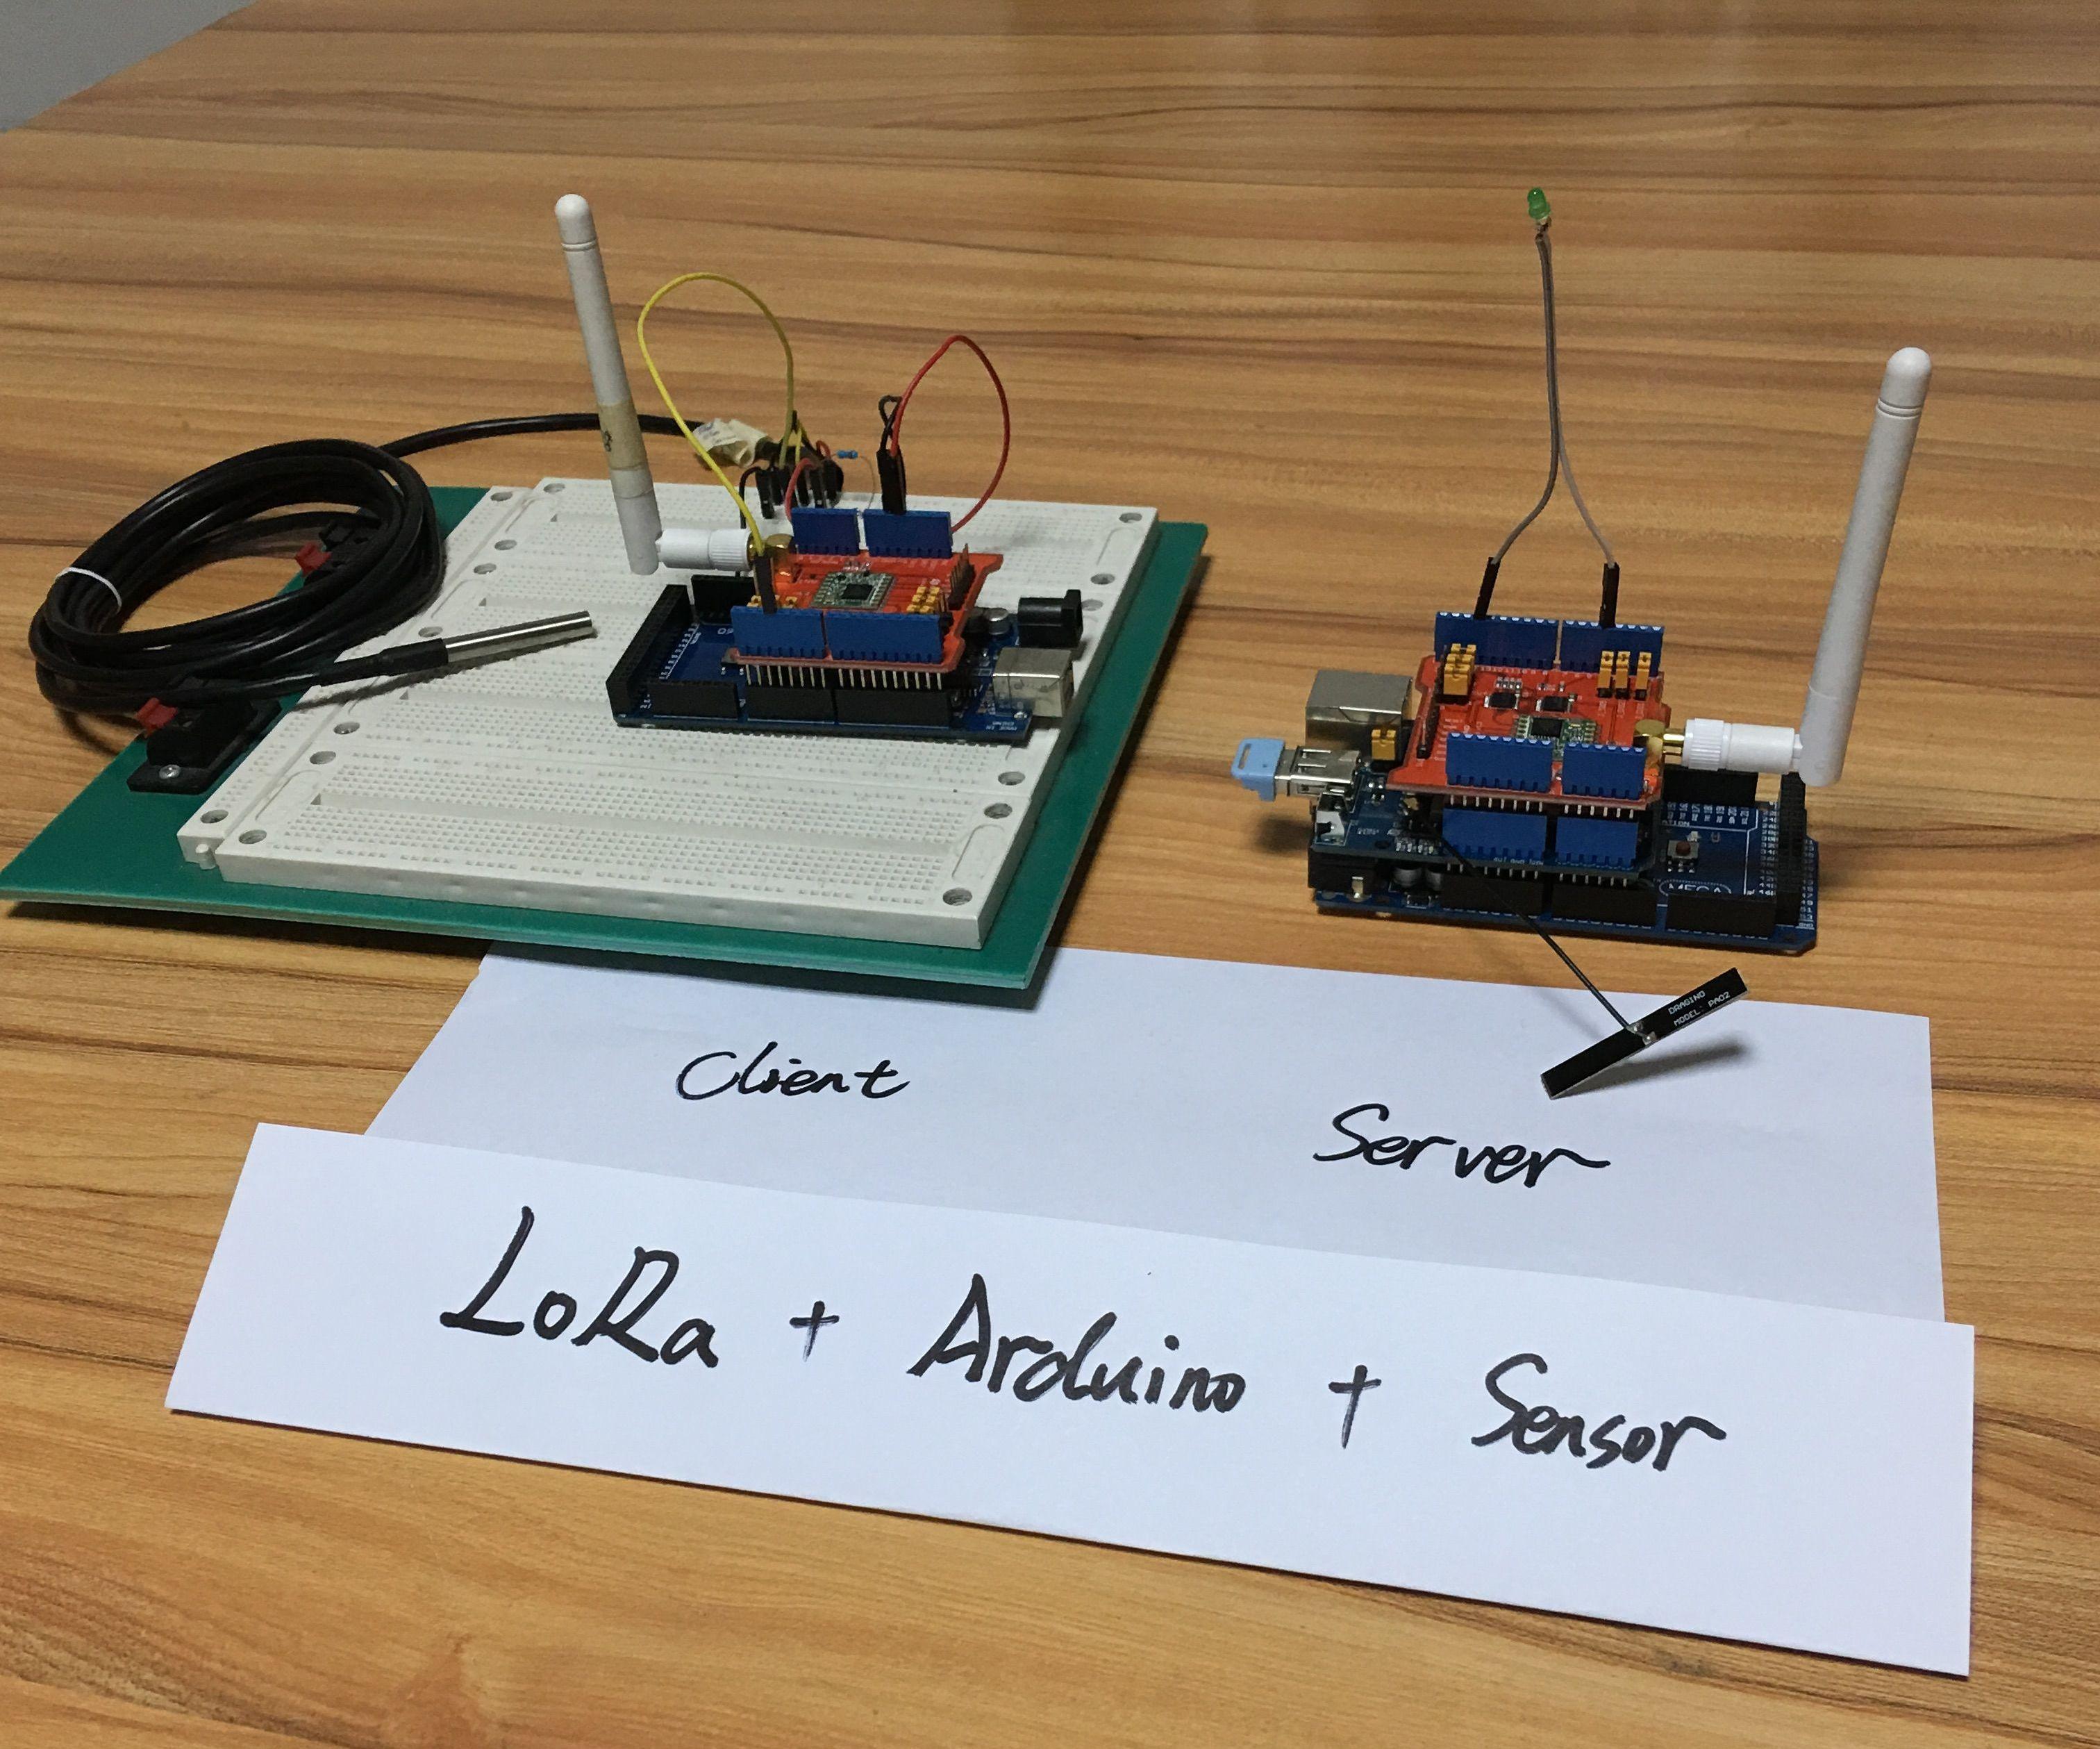 How to get sensor data from a remote Arduino via Wireless Lora Protocol